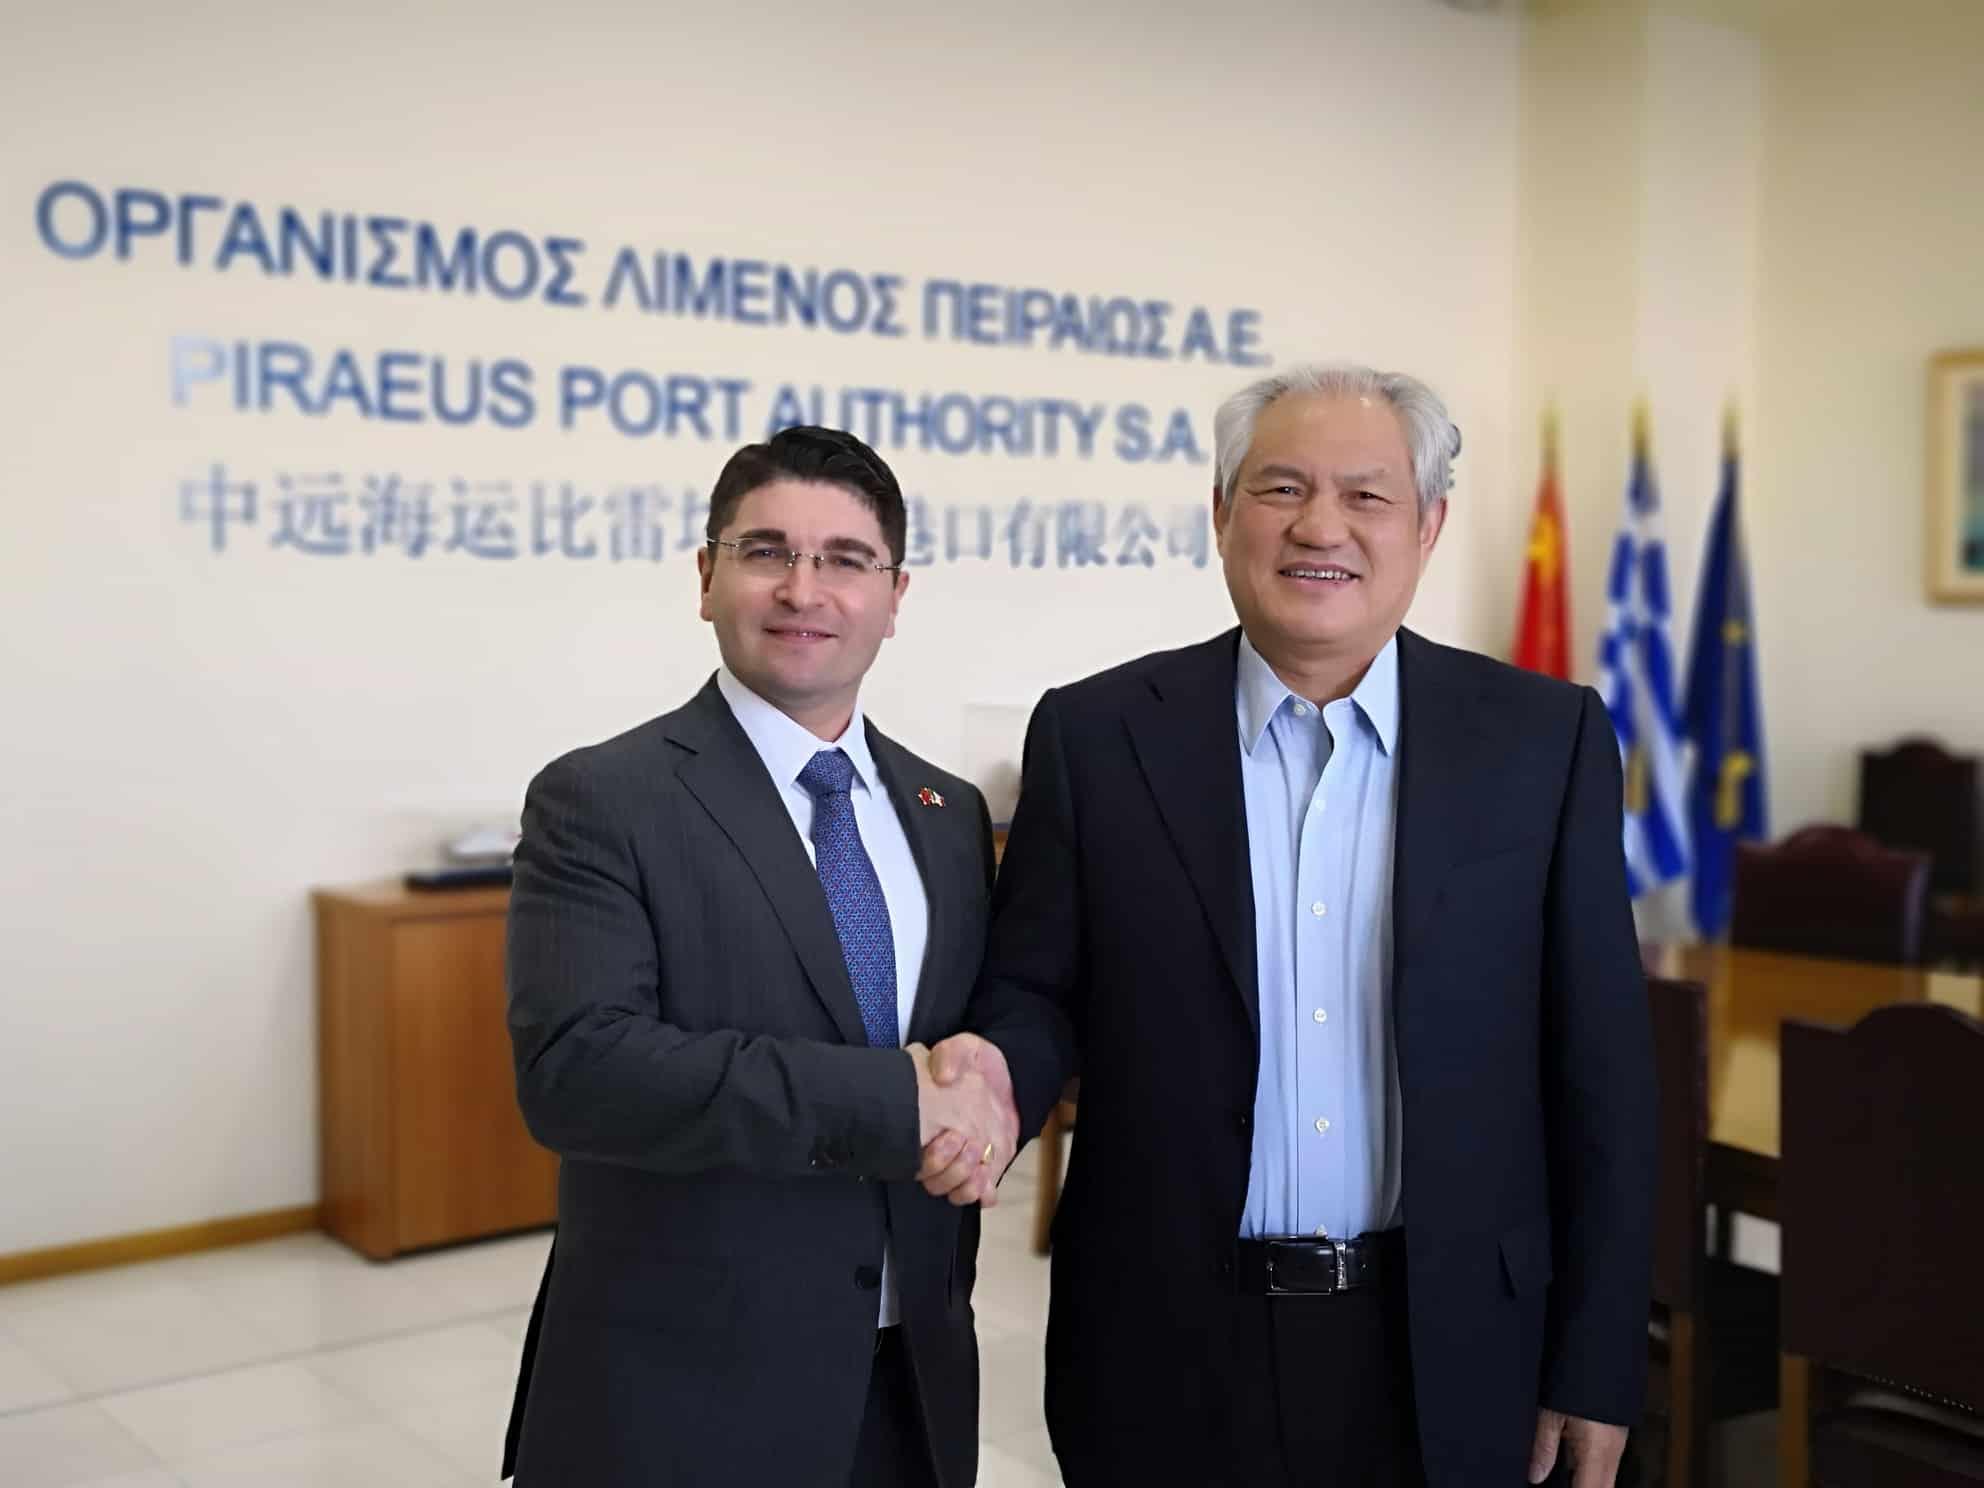 Piraeus, Venice and Chiogga agree to strengthen cargo flow